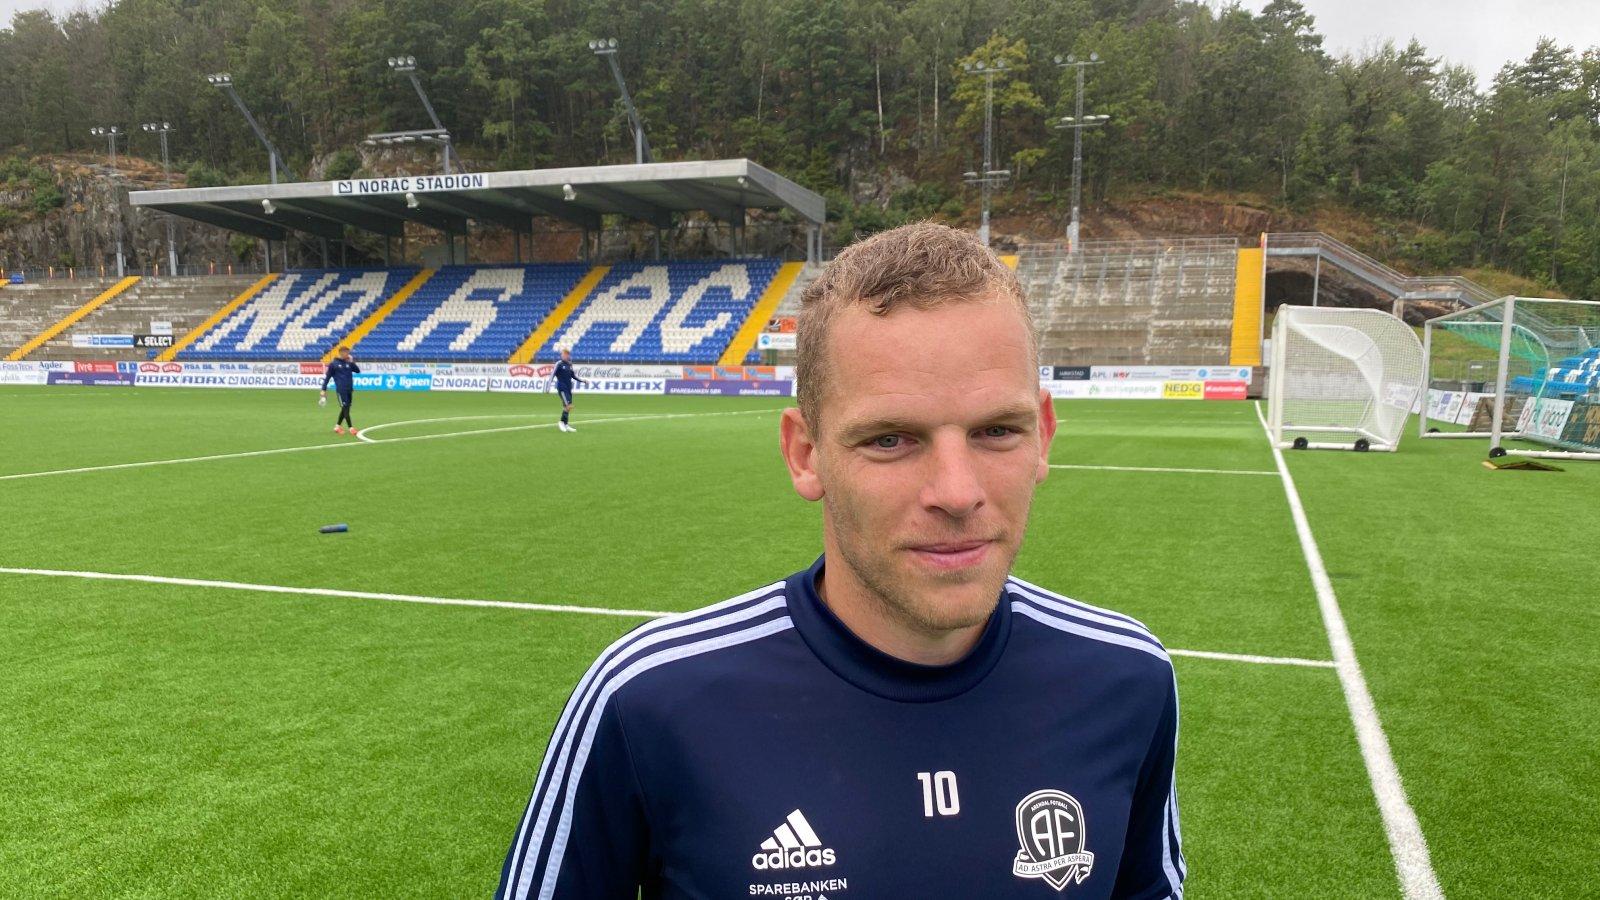 Jakob Rasmussen.